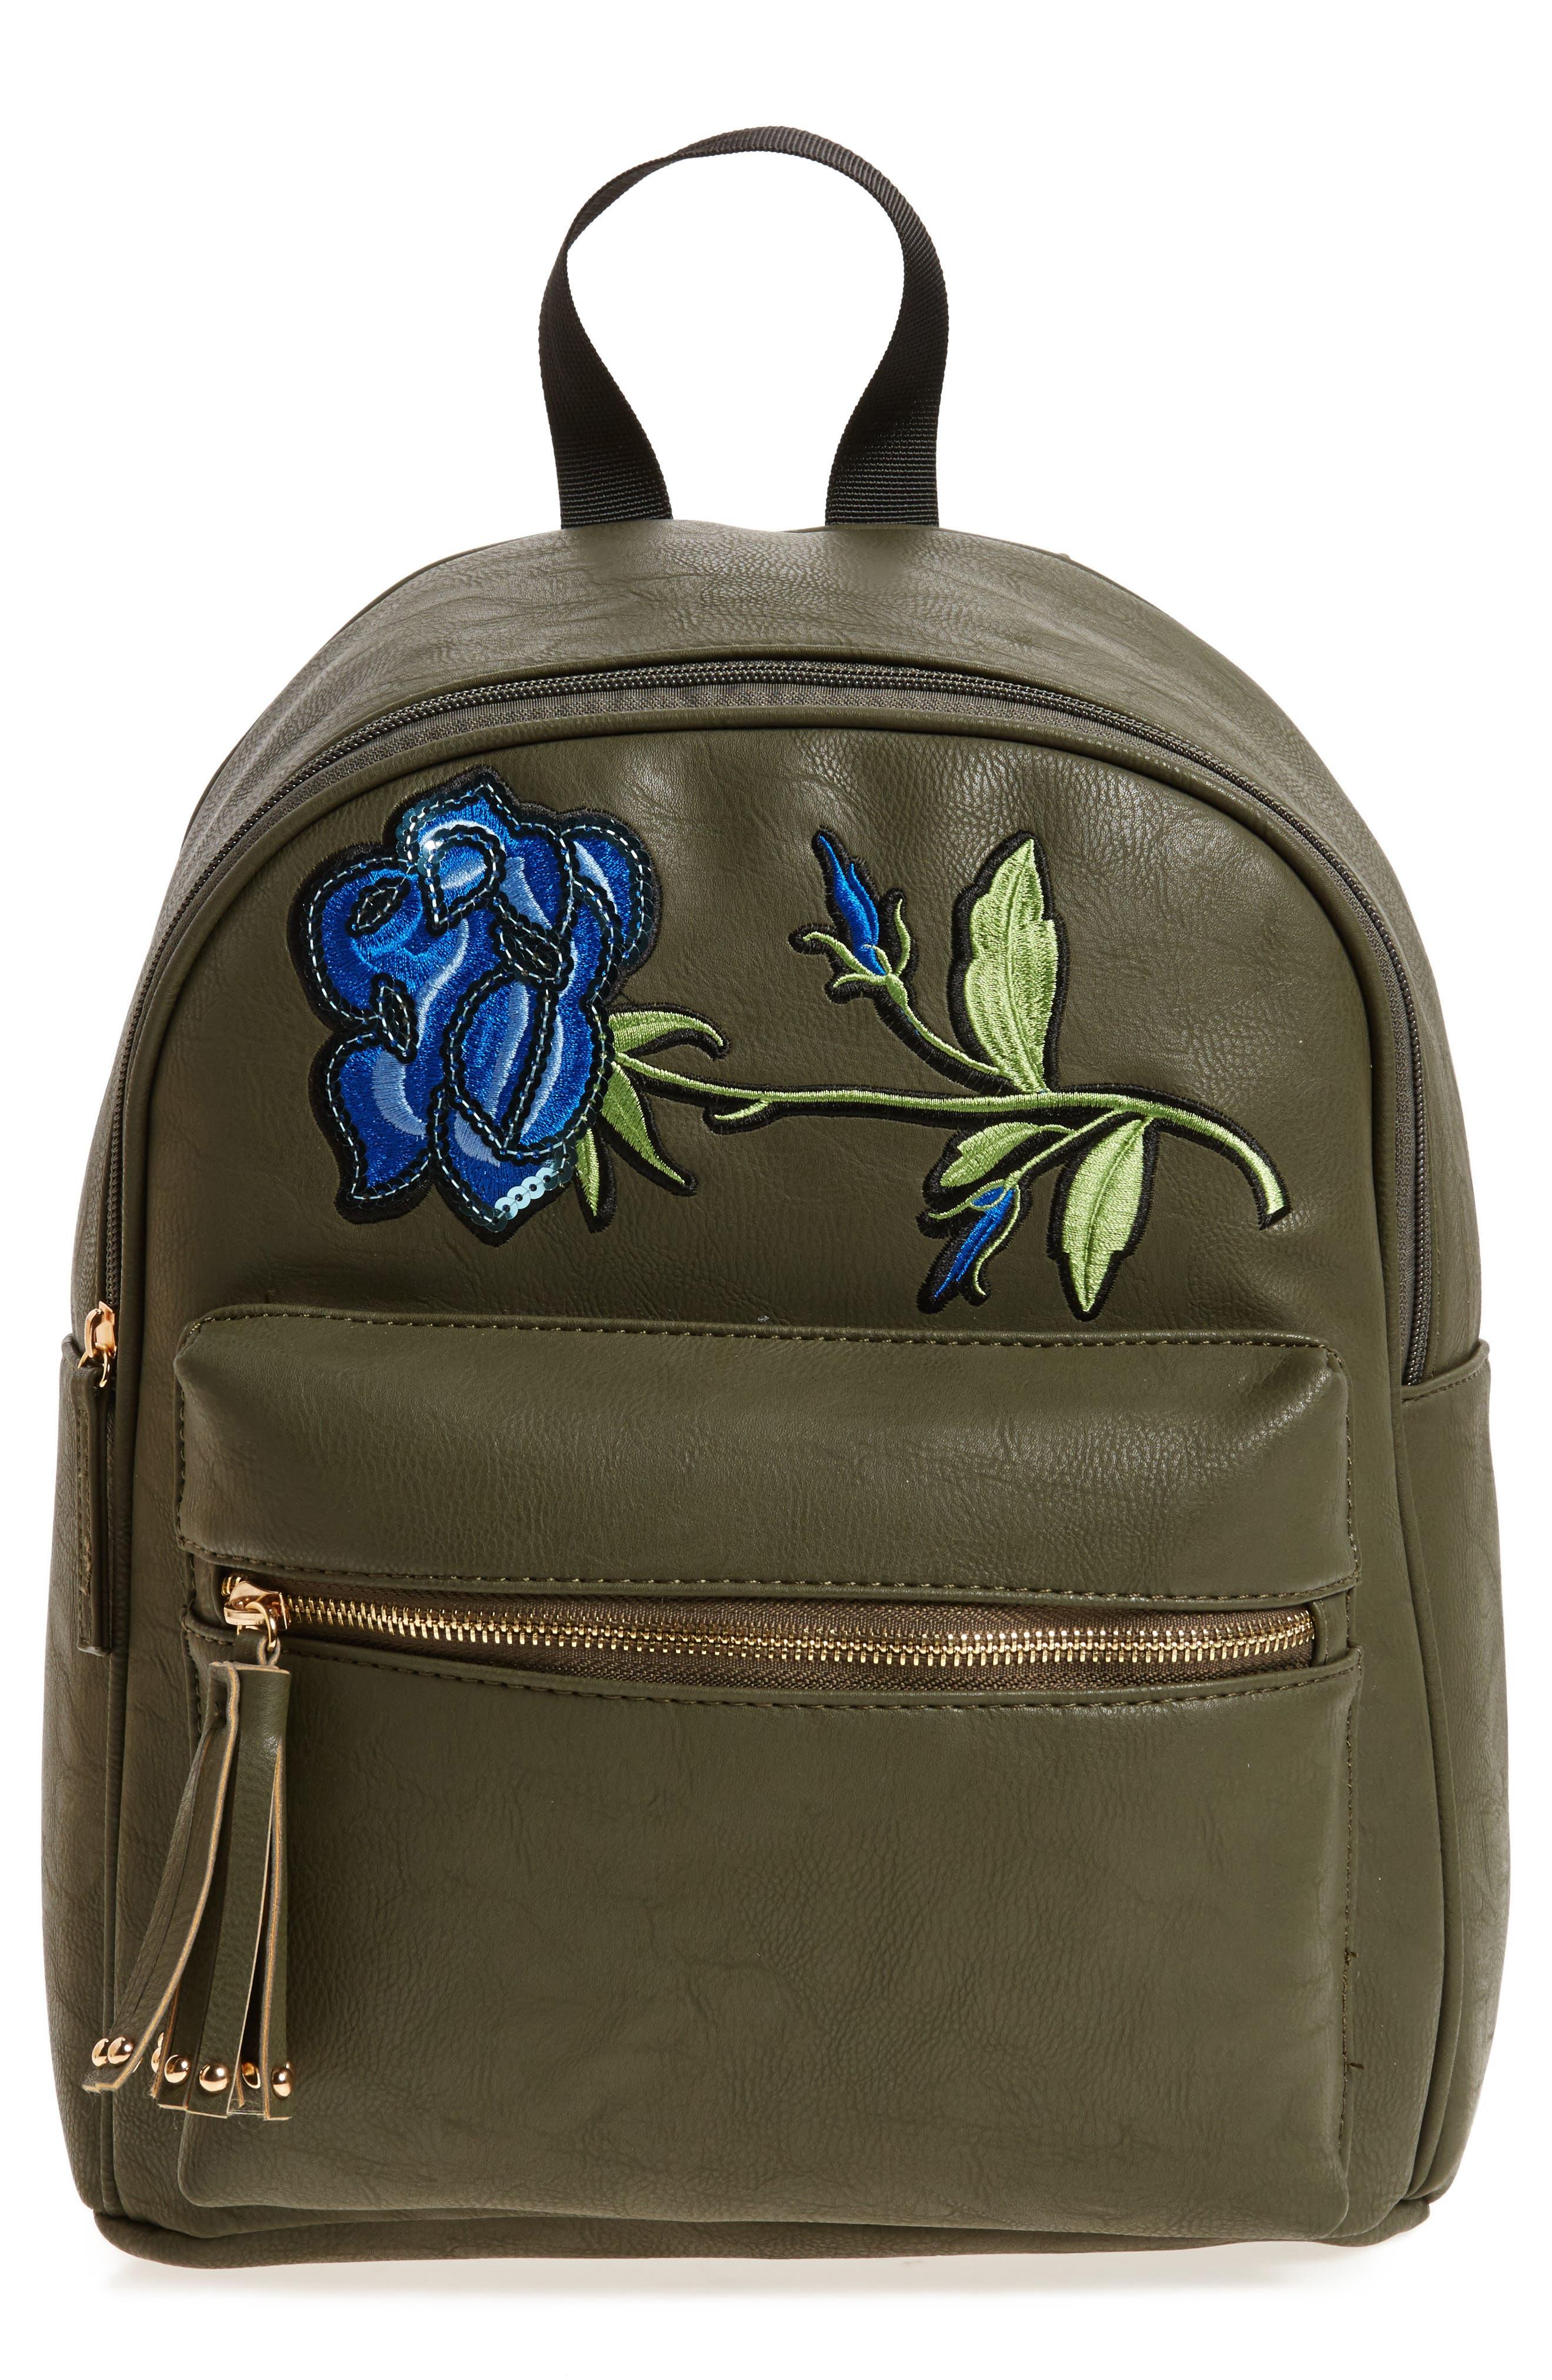 Sequin Rose Appliqué Faux Leather Backpack,                         Main,                         color, Olive